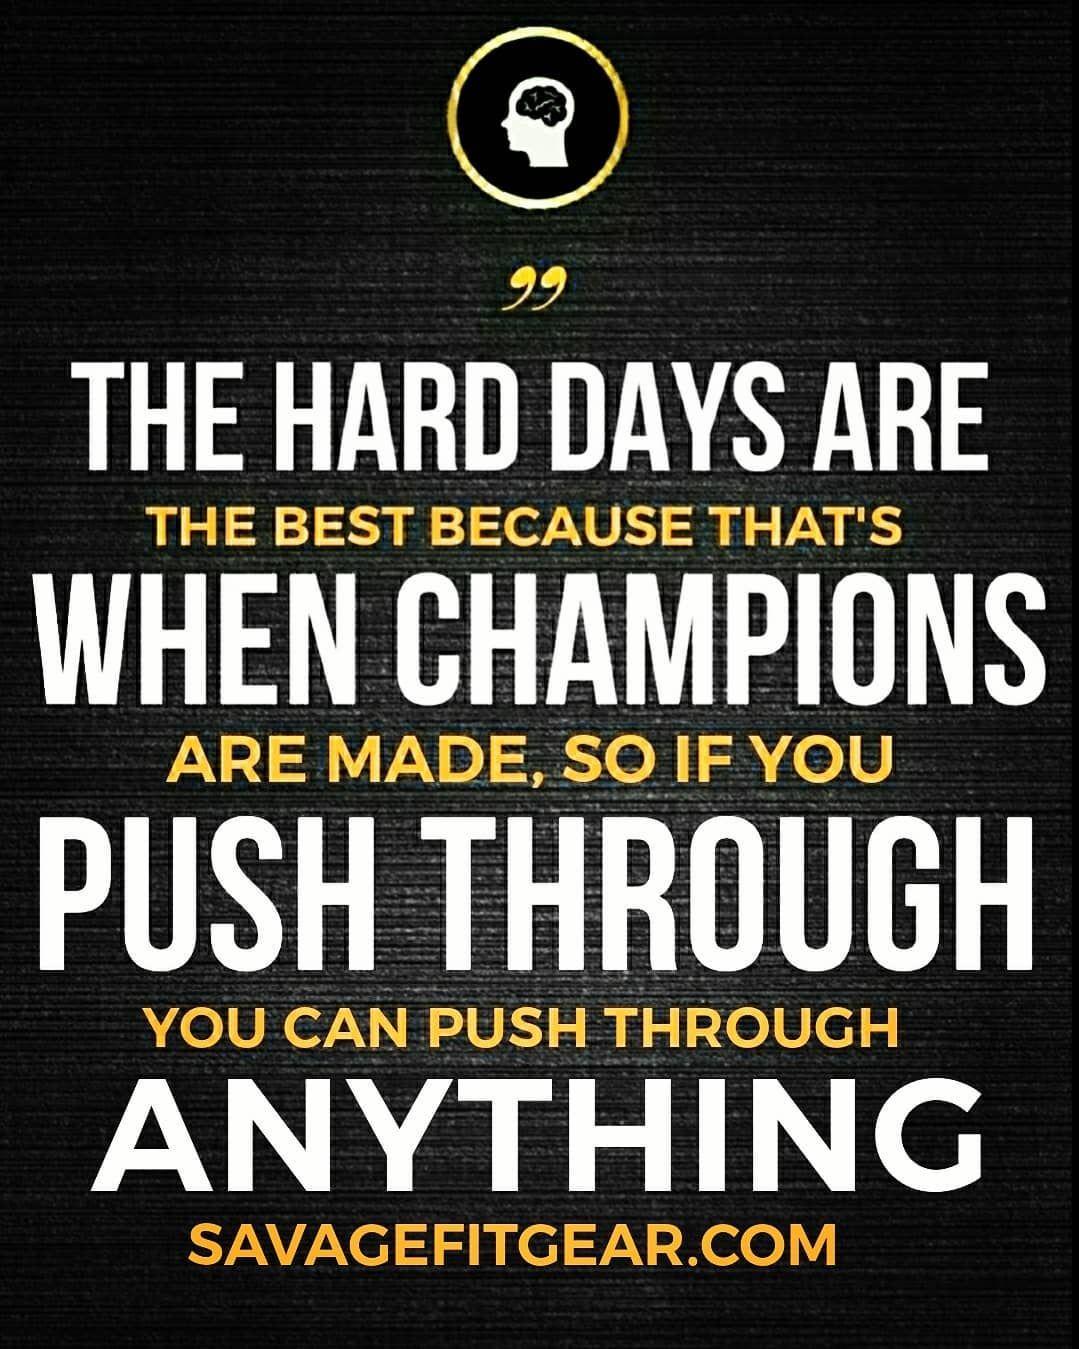 Keep Pushing Through These Hard Times We Will Emerge As Champions Staysafe Tech Company Logos Hard Days Company Logo